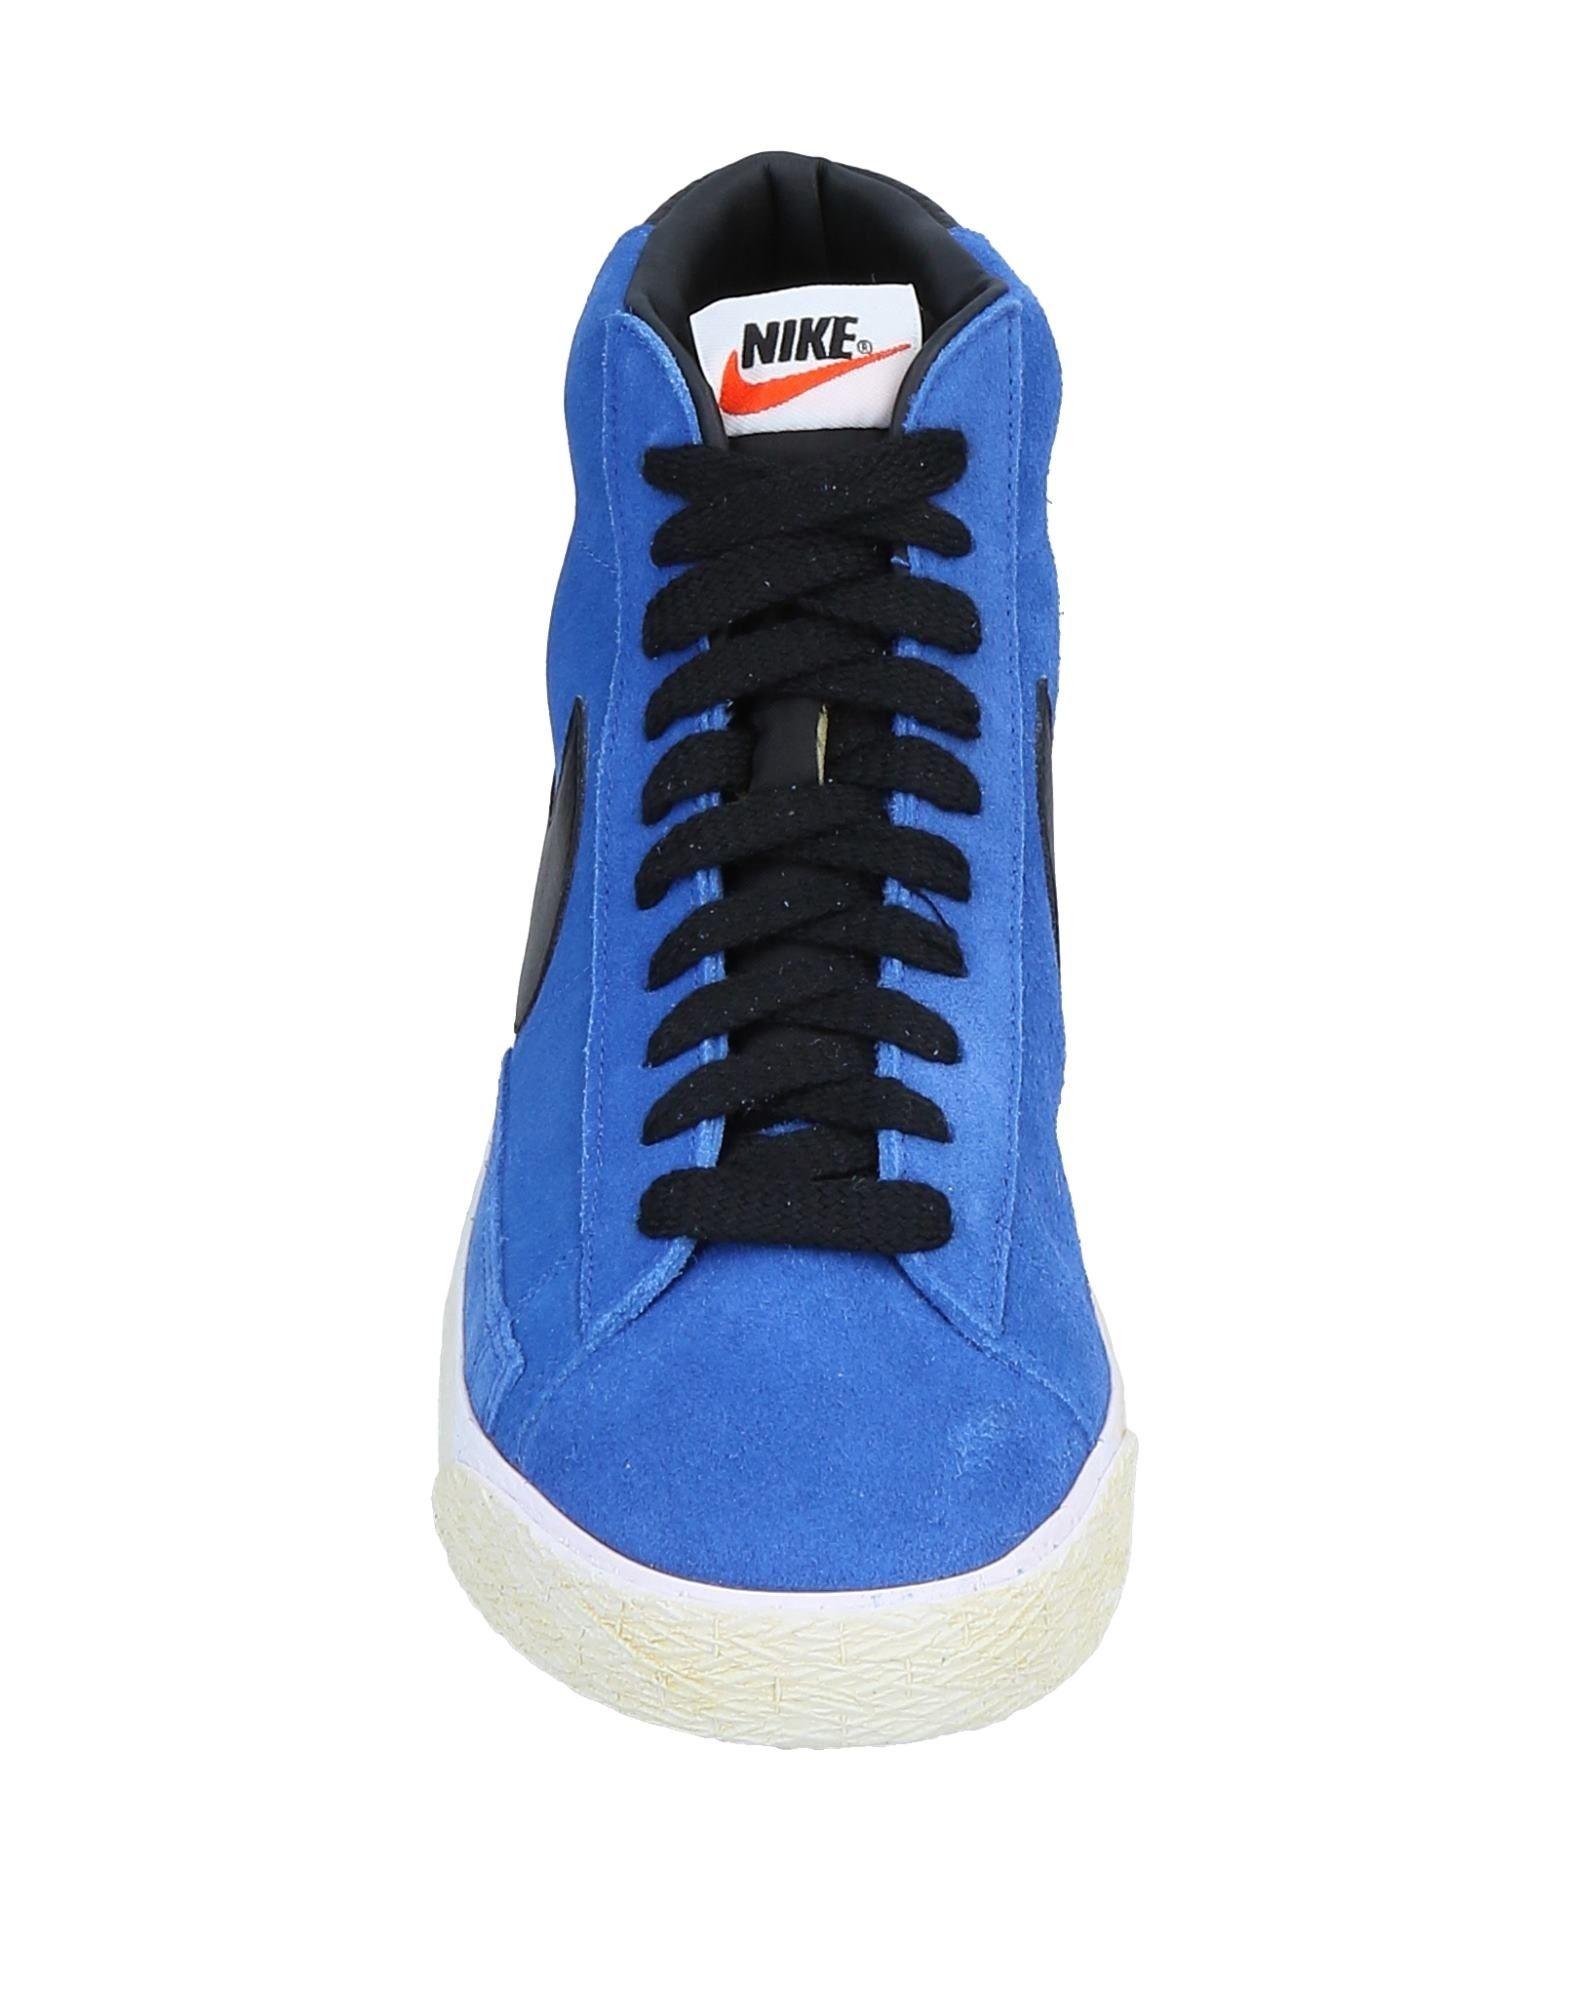 Rabatt echte Schuhe Nike Sneakers Herren  11571454WX 11571454WX 11571454WX fe34a3